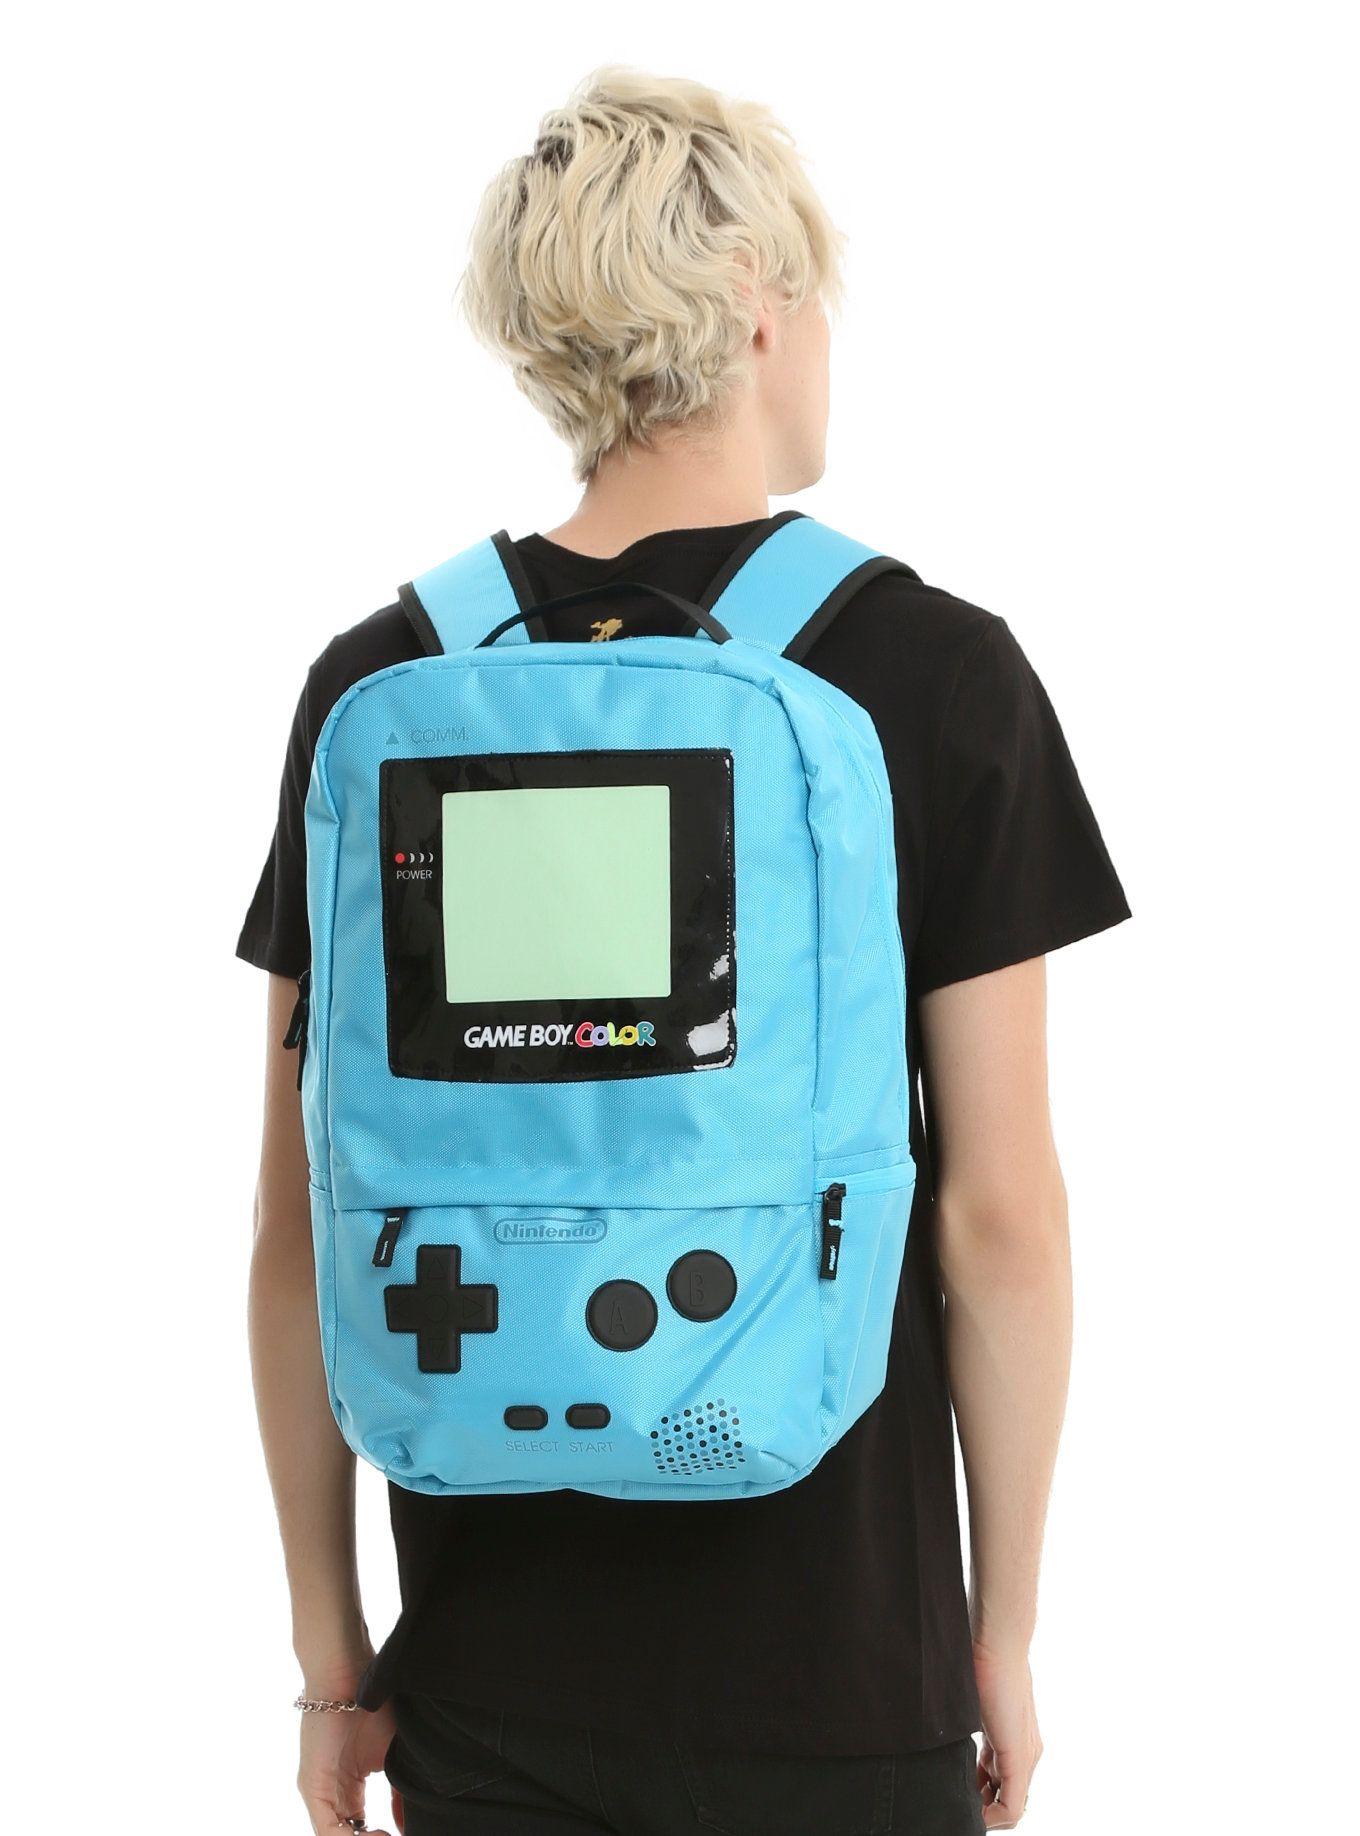 Game Boy Color Backpack  shutupandtakemyyen  gameboy  nintendo  backpack   bag  nintendomerch  Nintendomerchandise  retro  retrogaming  gameboycolor 79cdbd5a7d583